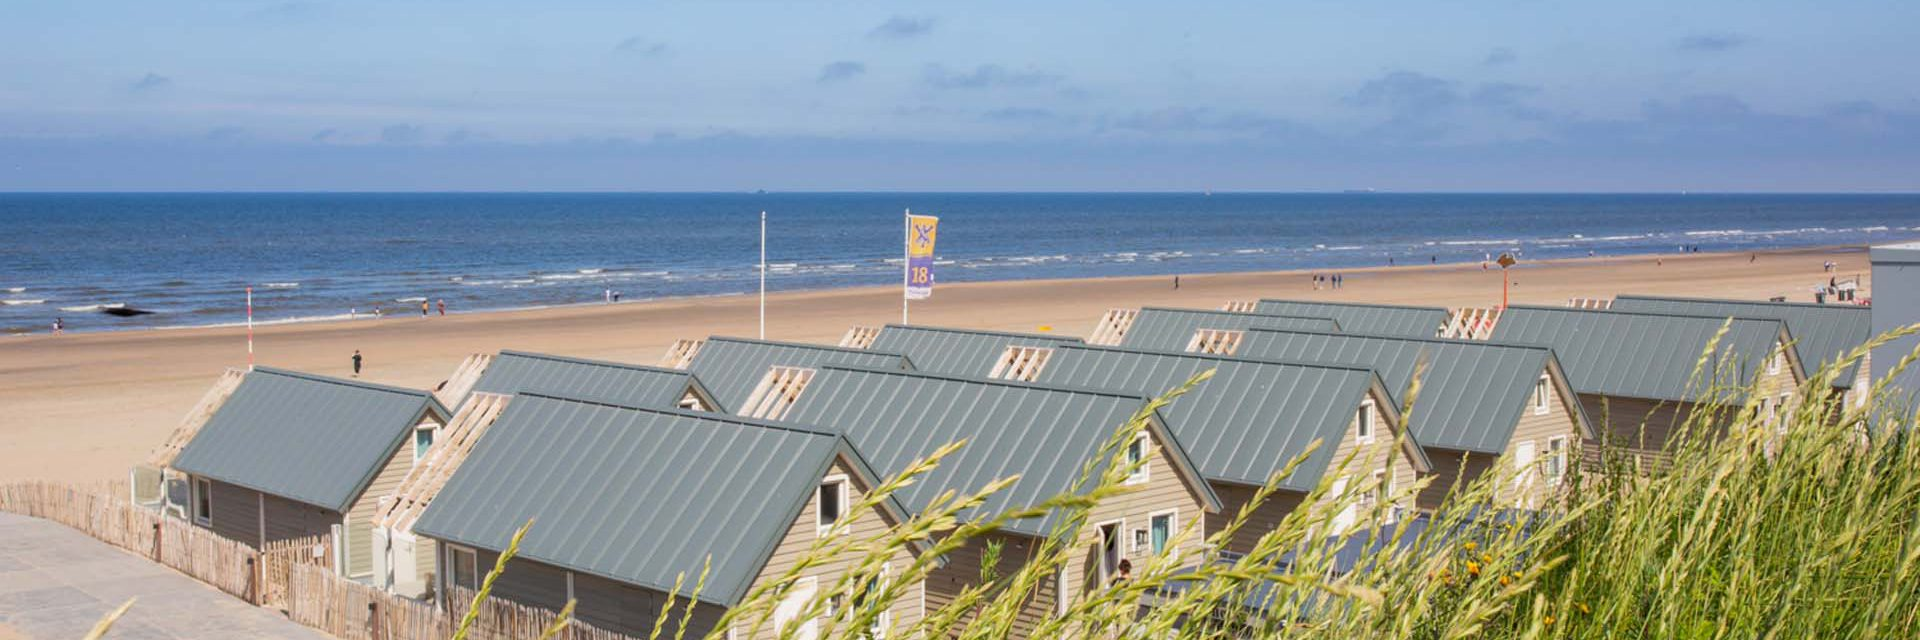 Thalassa Beachhouse - strand Zandvoort strandbungalows